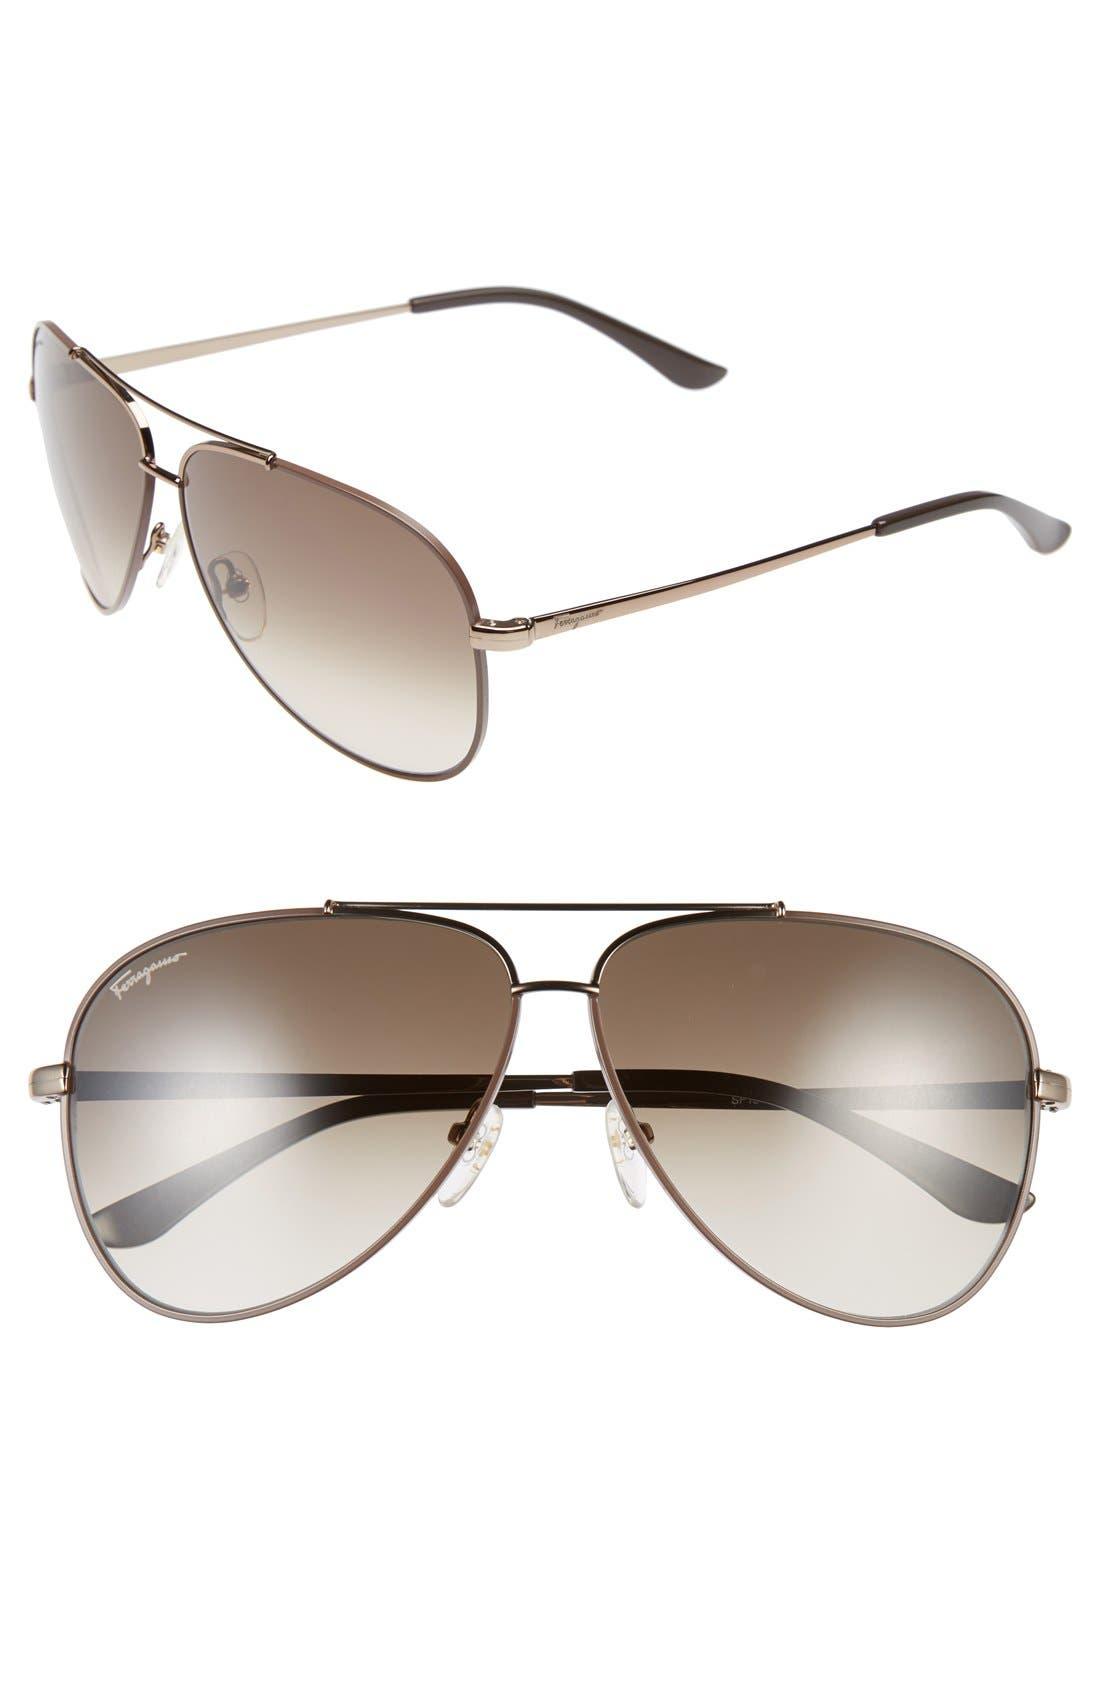 60mm Aviator Sunglasses,                         Main,                         color, 211